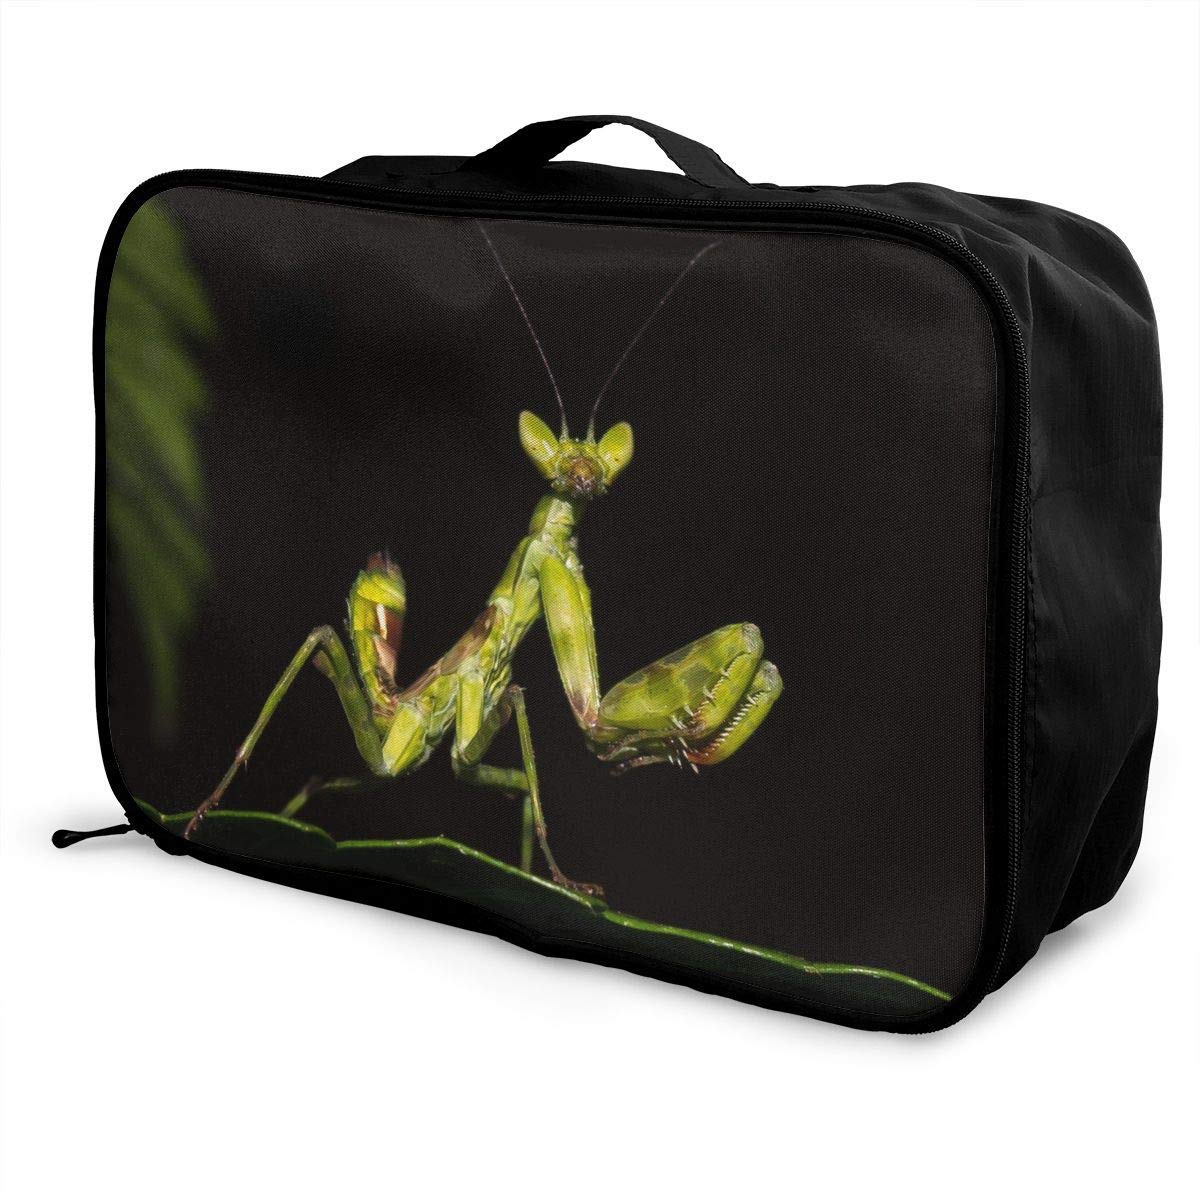 Lightweight Large Capacity Portable Duffel Bag for Men /& Women Mantis Animal Travel Duffel Bag Backpack JTRVW Luggage Bags for Travel